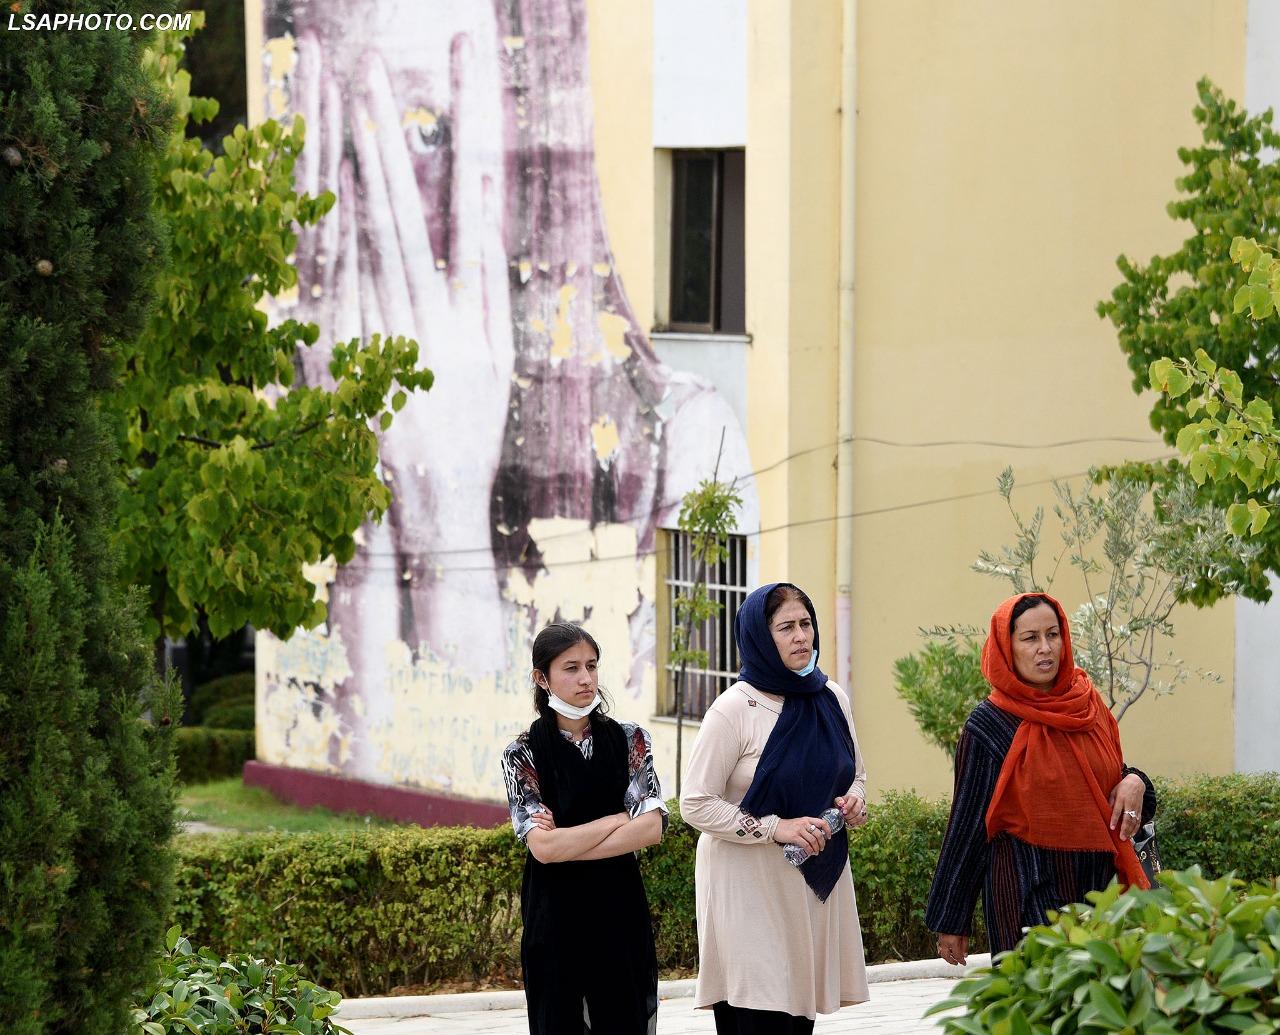 afganeqytetistudenti-26